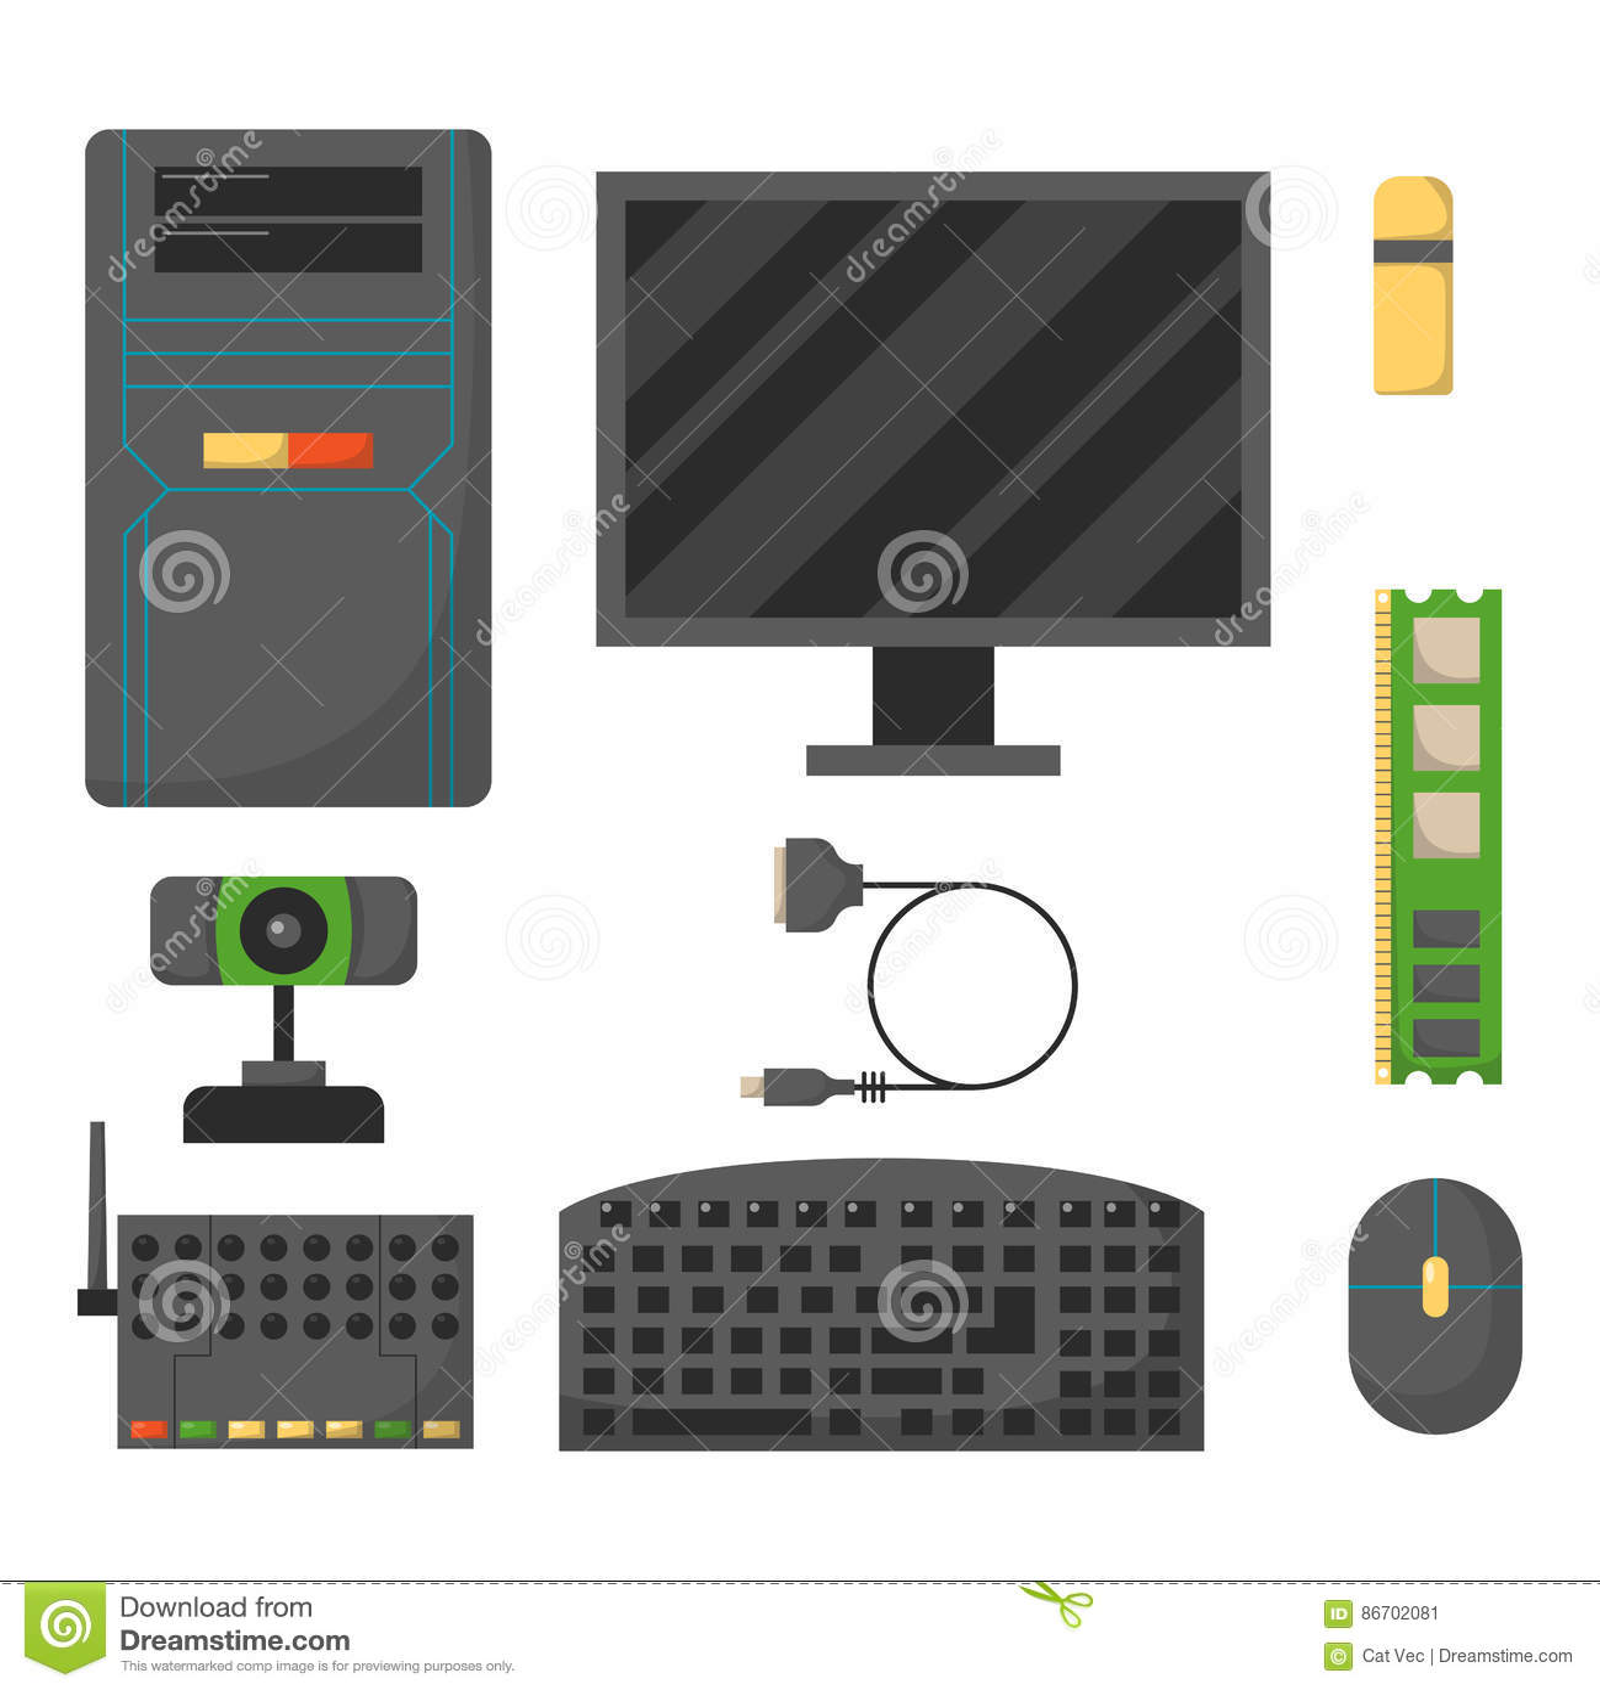 Desktop Pc Diagram - Car Wiring Diagrams Explained •